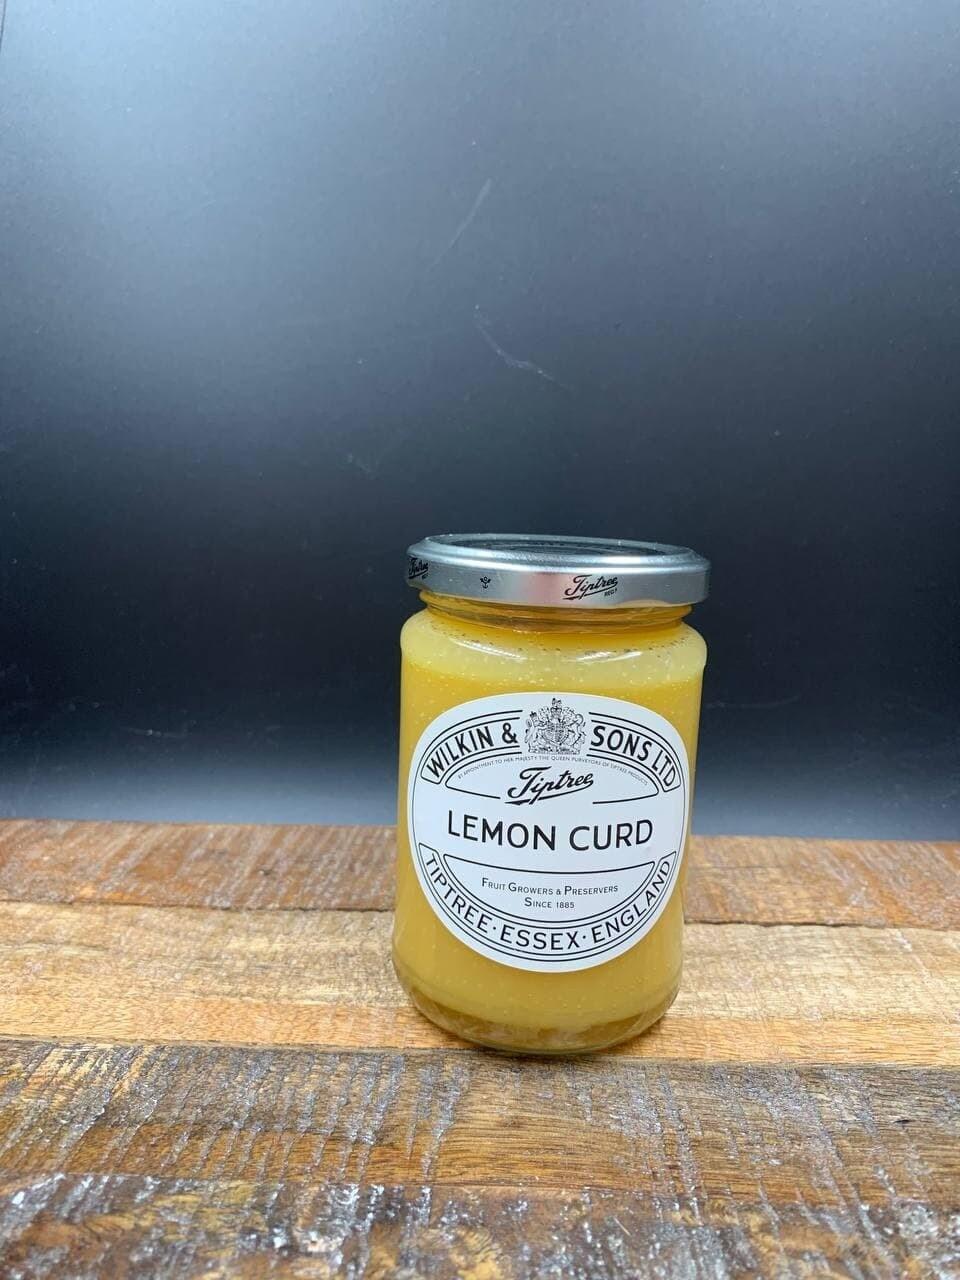 Wilkin & Sons Ltd. TipTree Lemon Curd